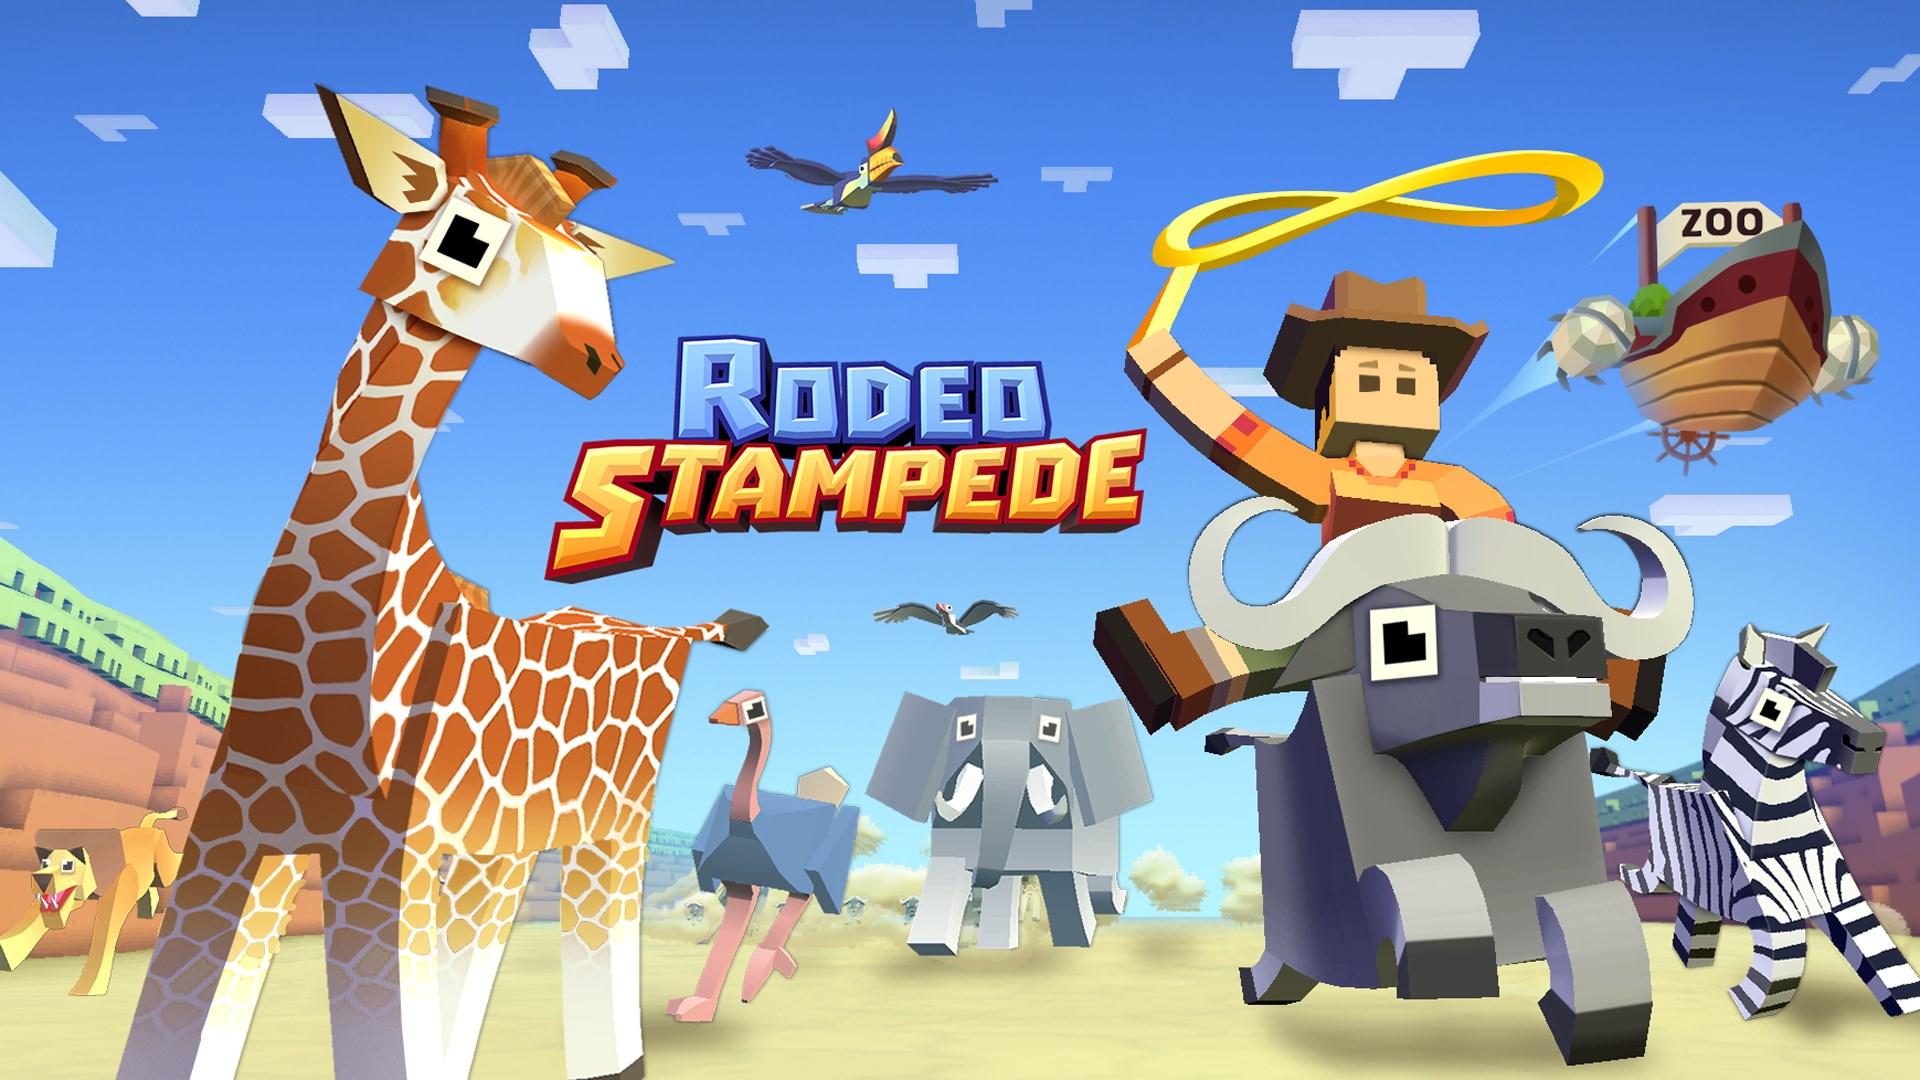 تحميل لعبة rodeo stampede للكمبيوتر